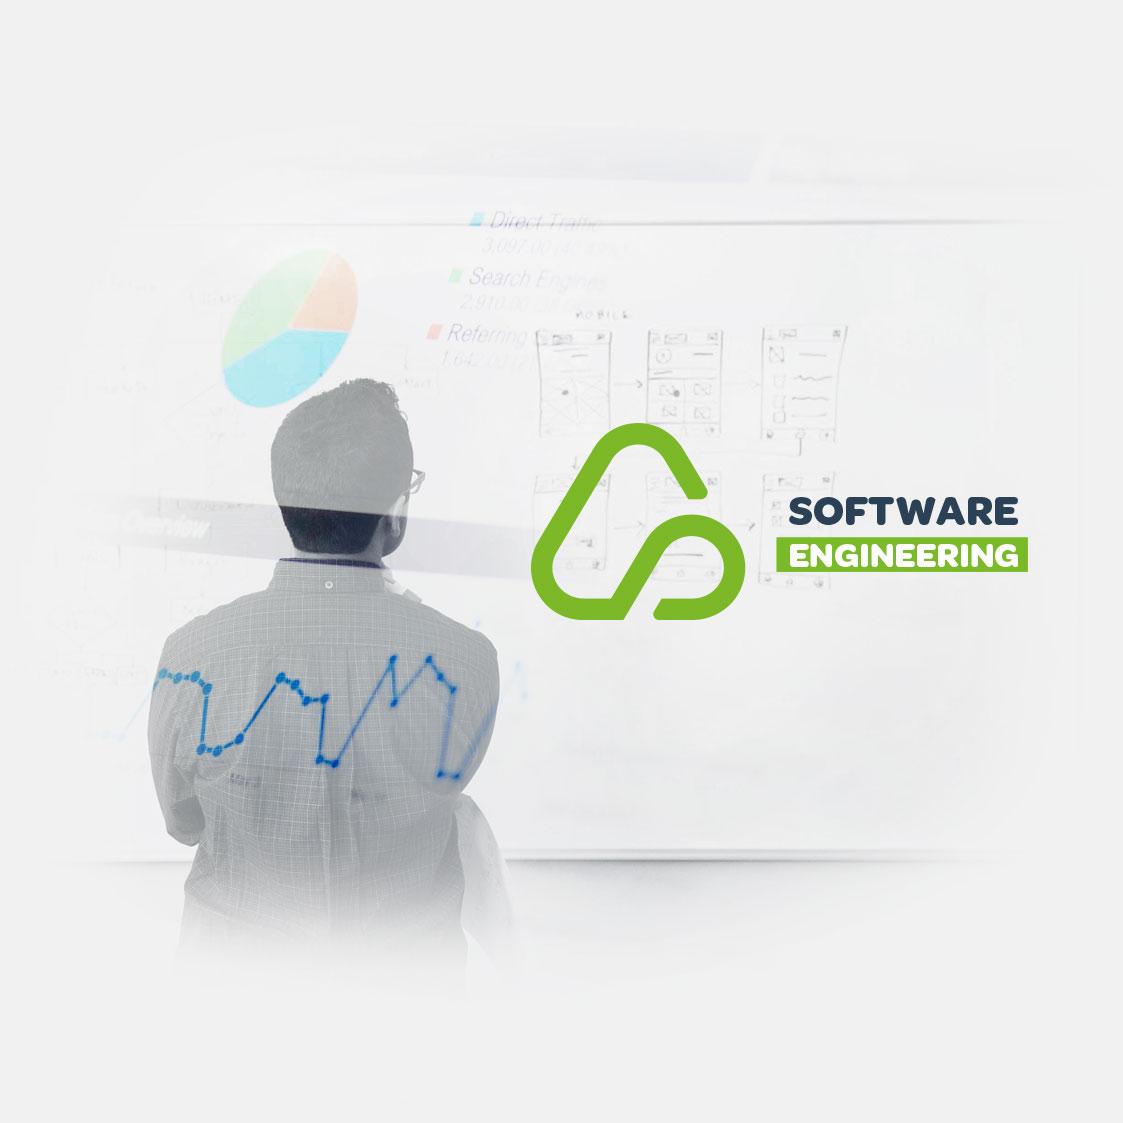 NoseDat Software Engineering